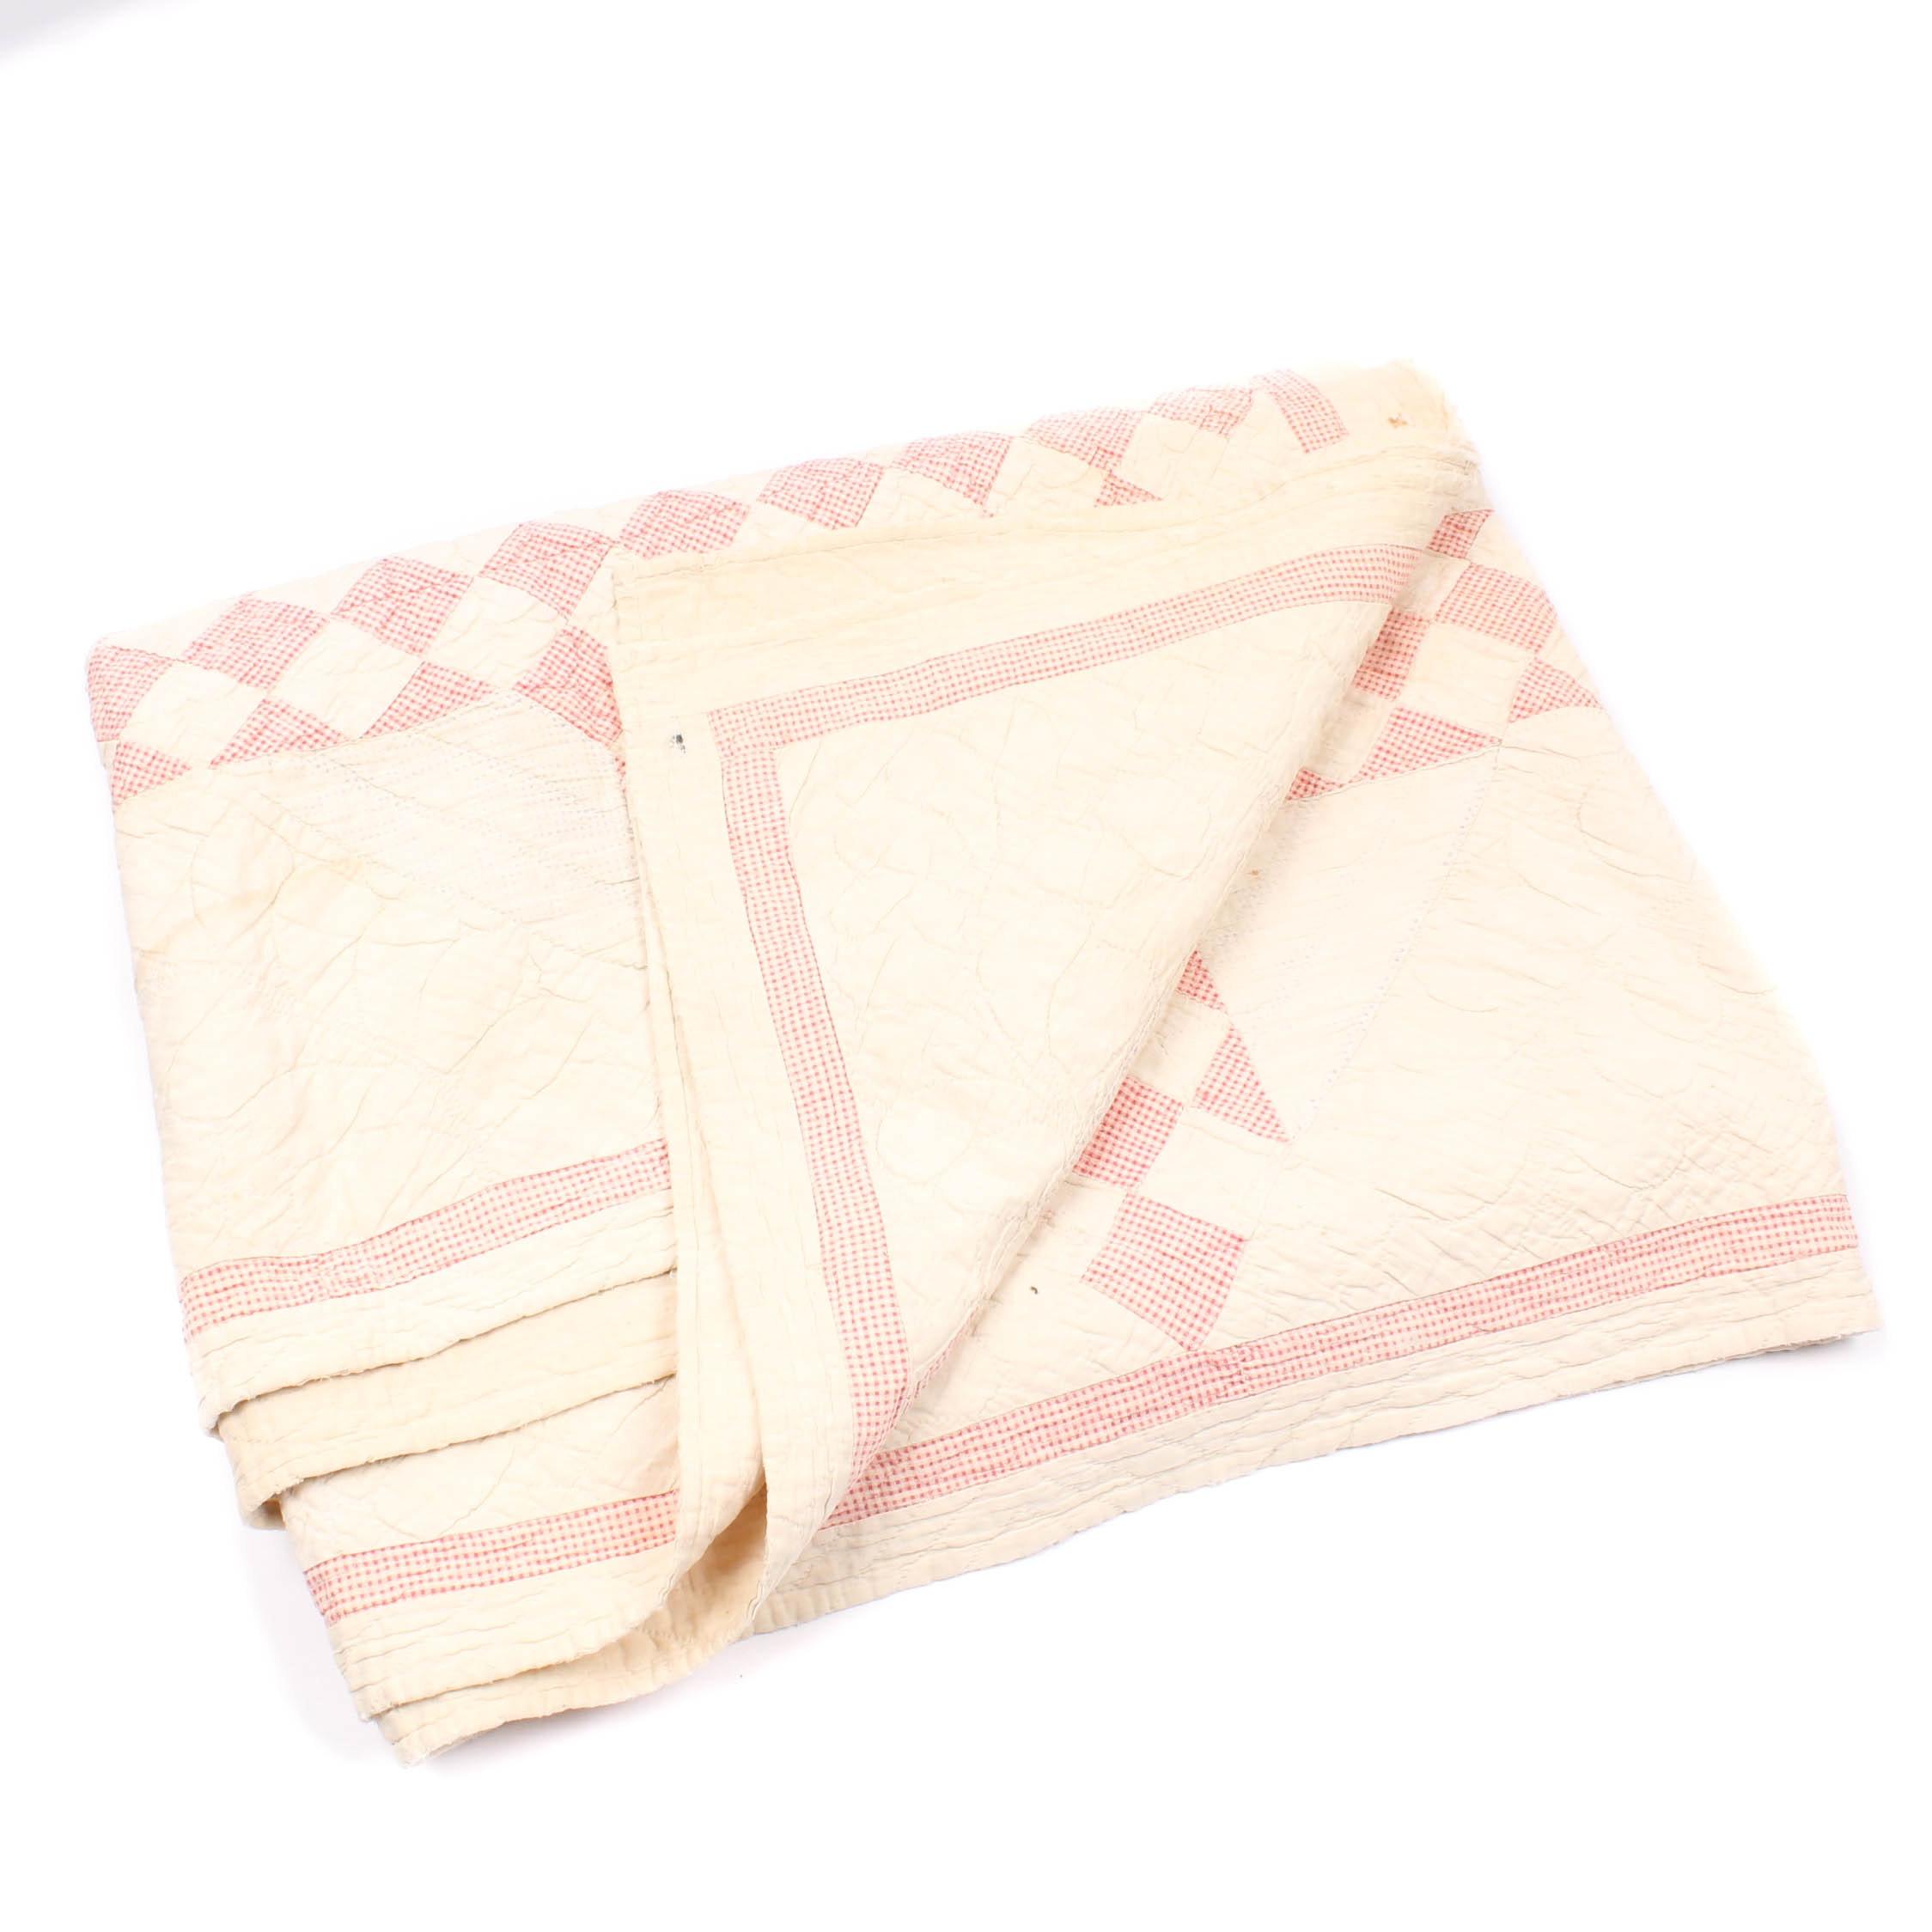 Vintage Hand Sewn Quilt